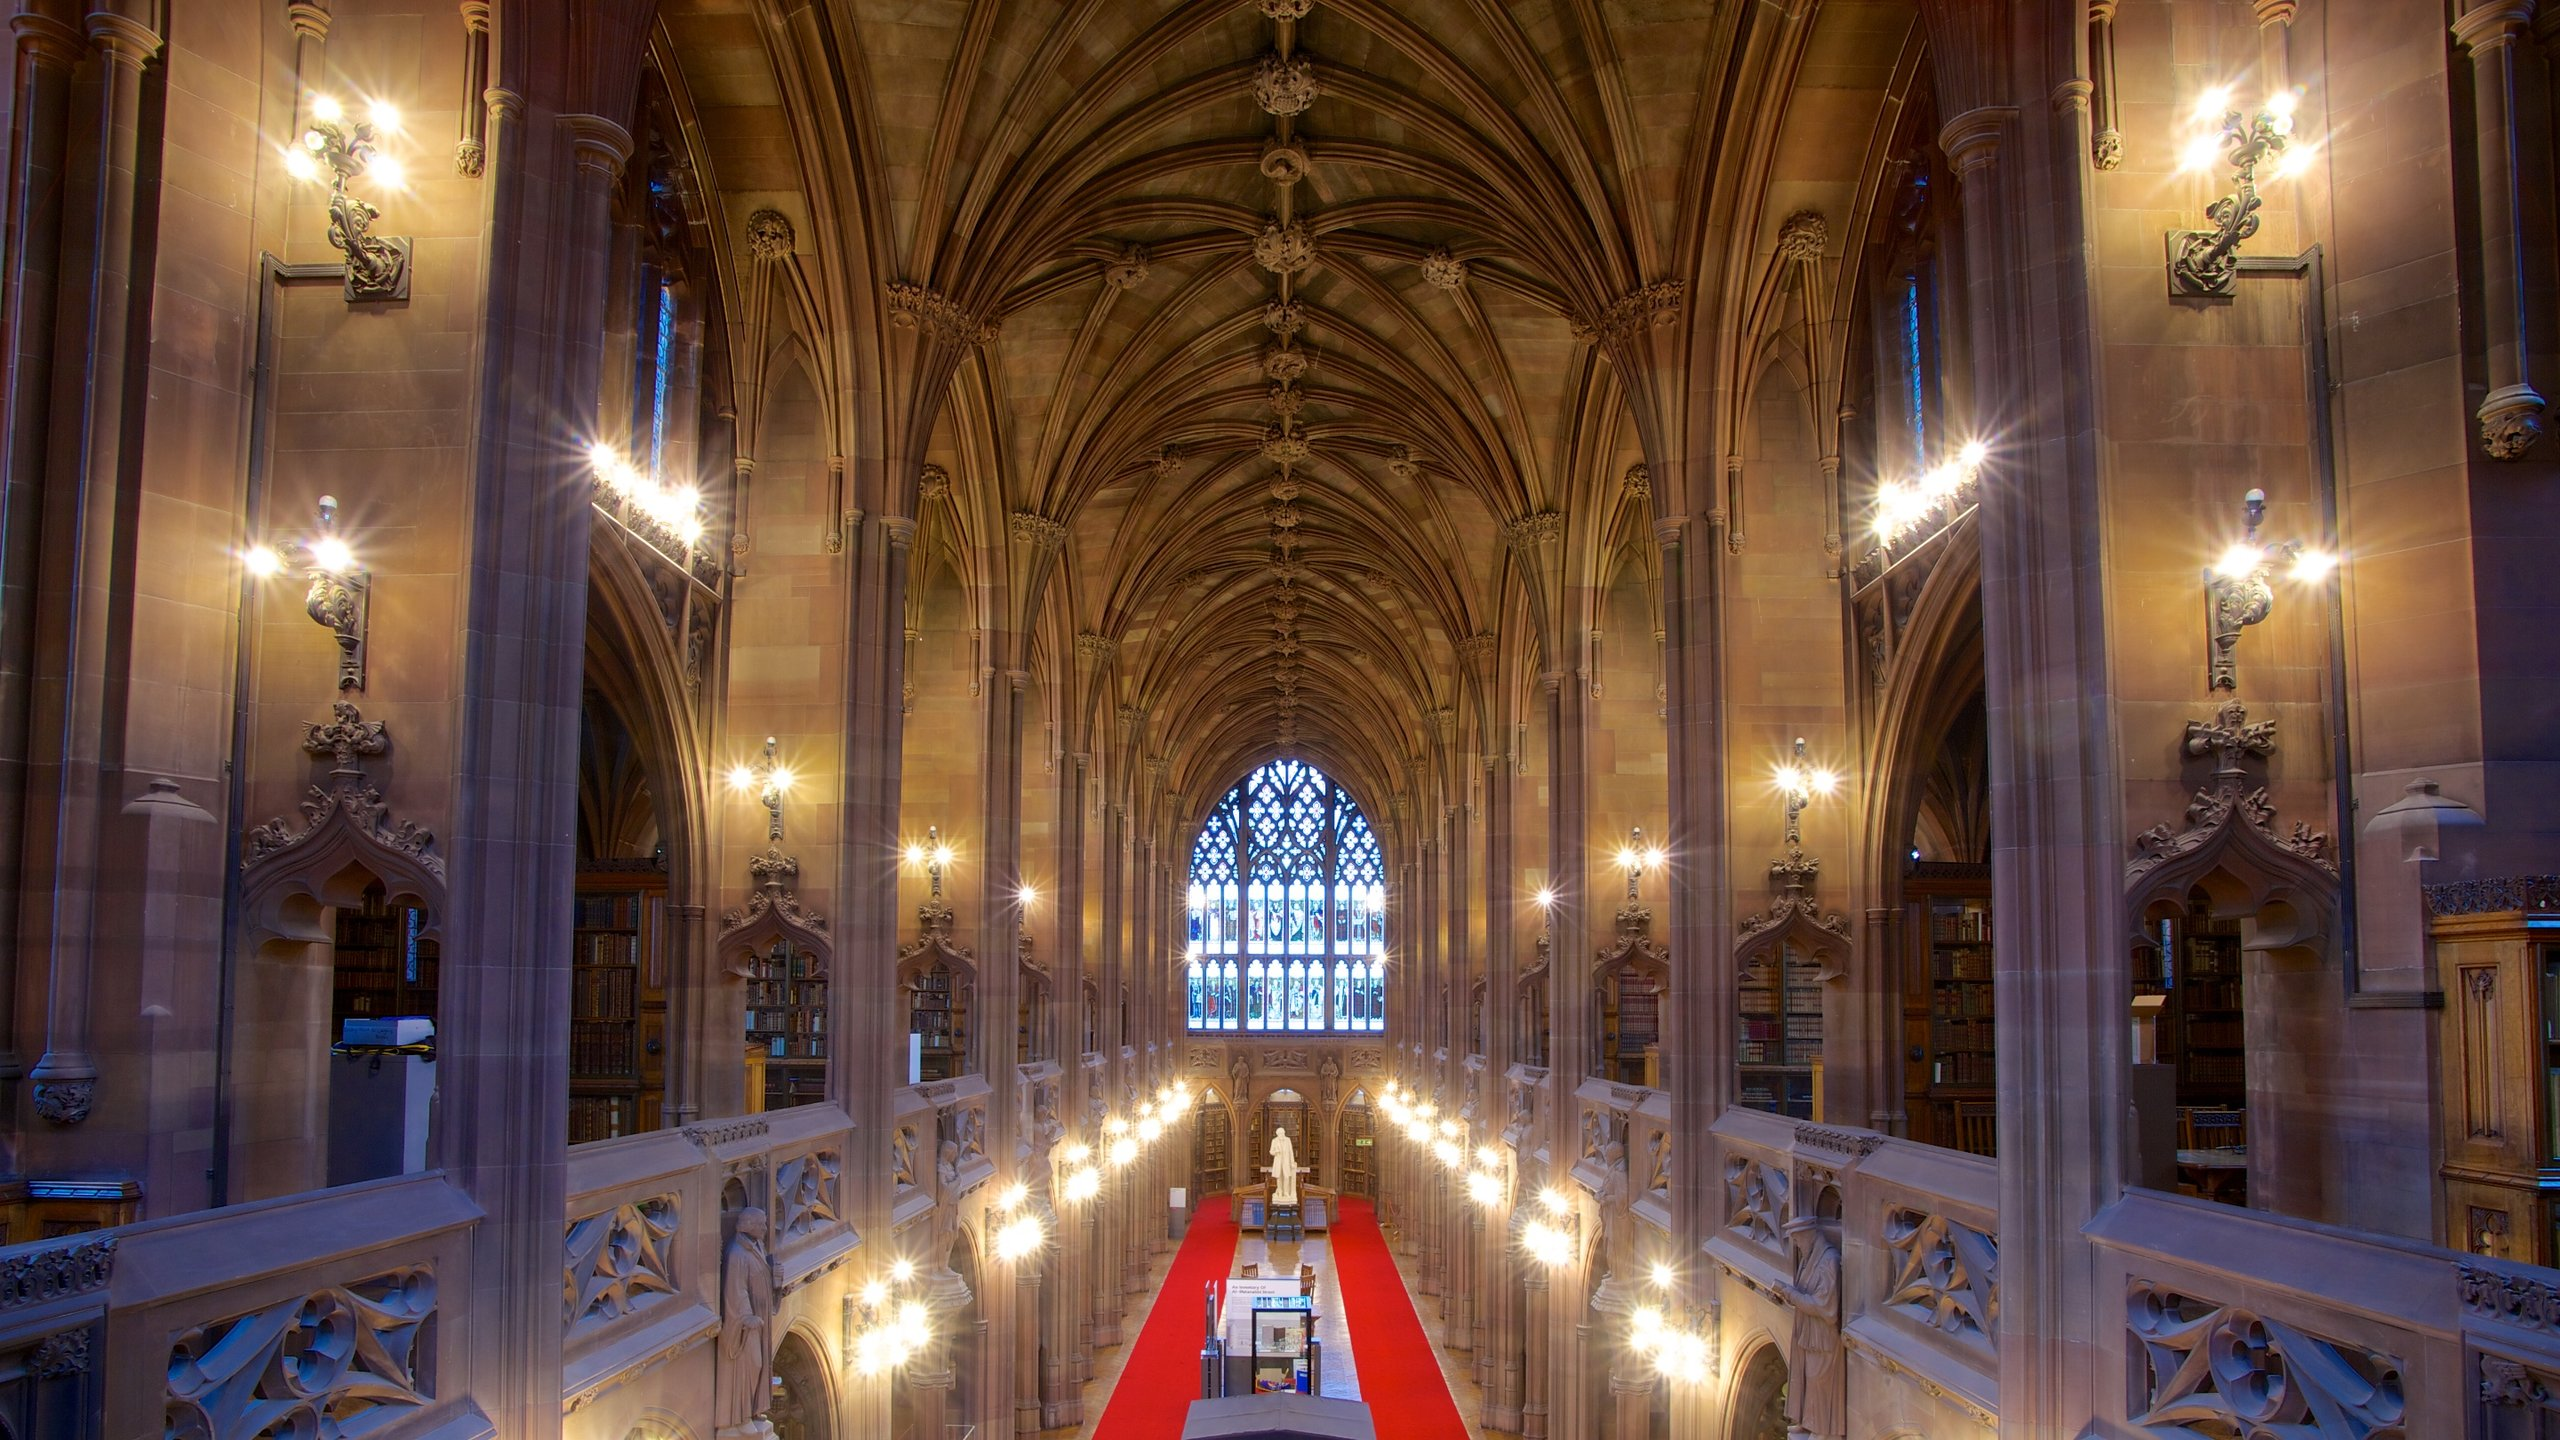 John Rylands University Library, Manchester, Inglaterra, Reino Unido